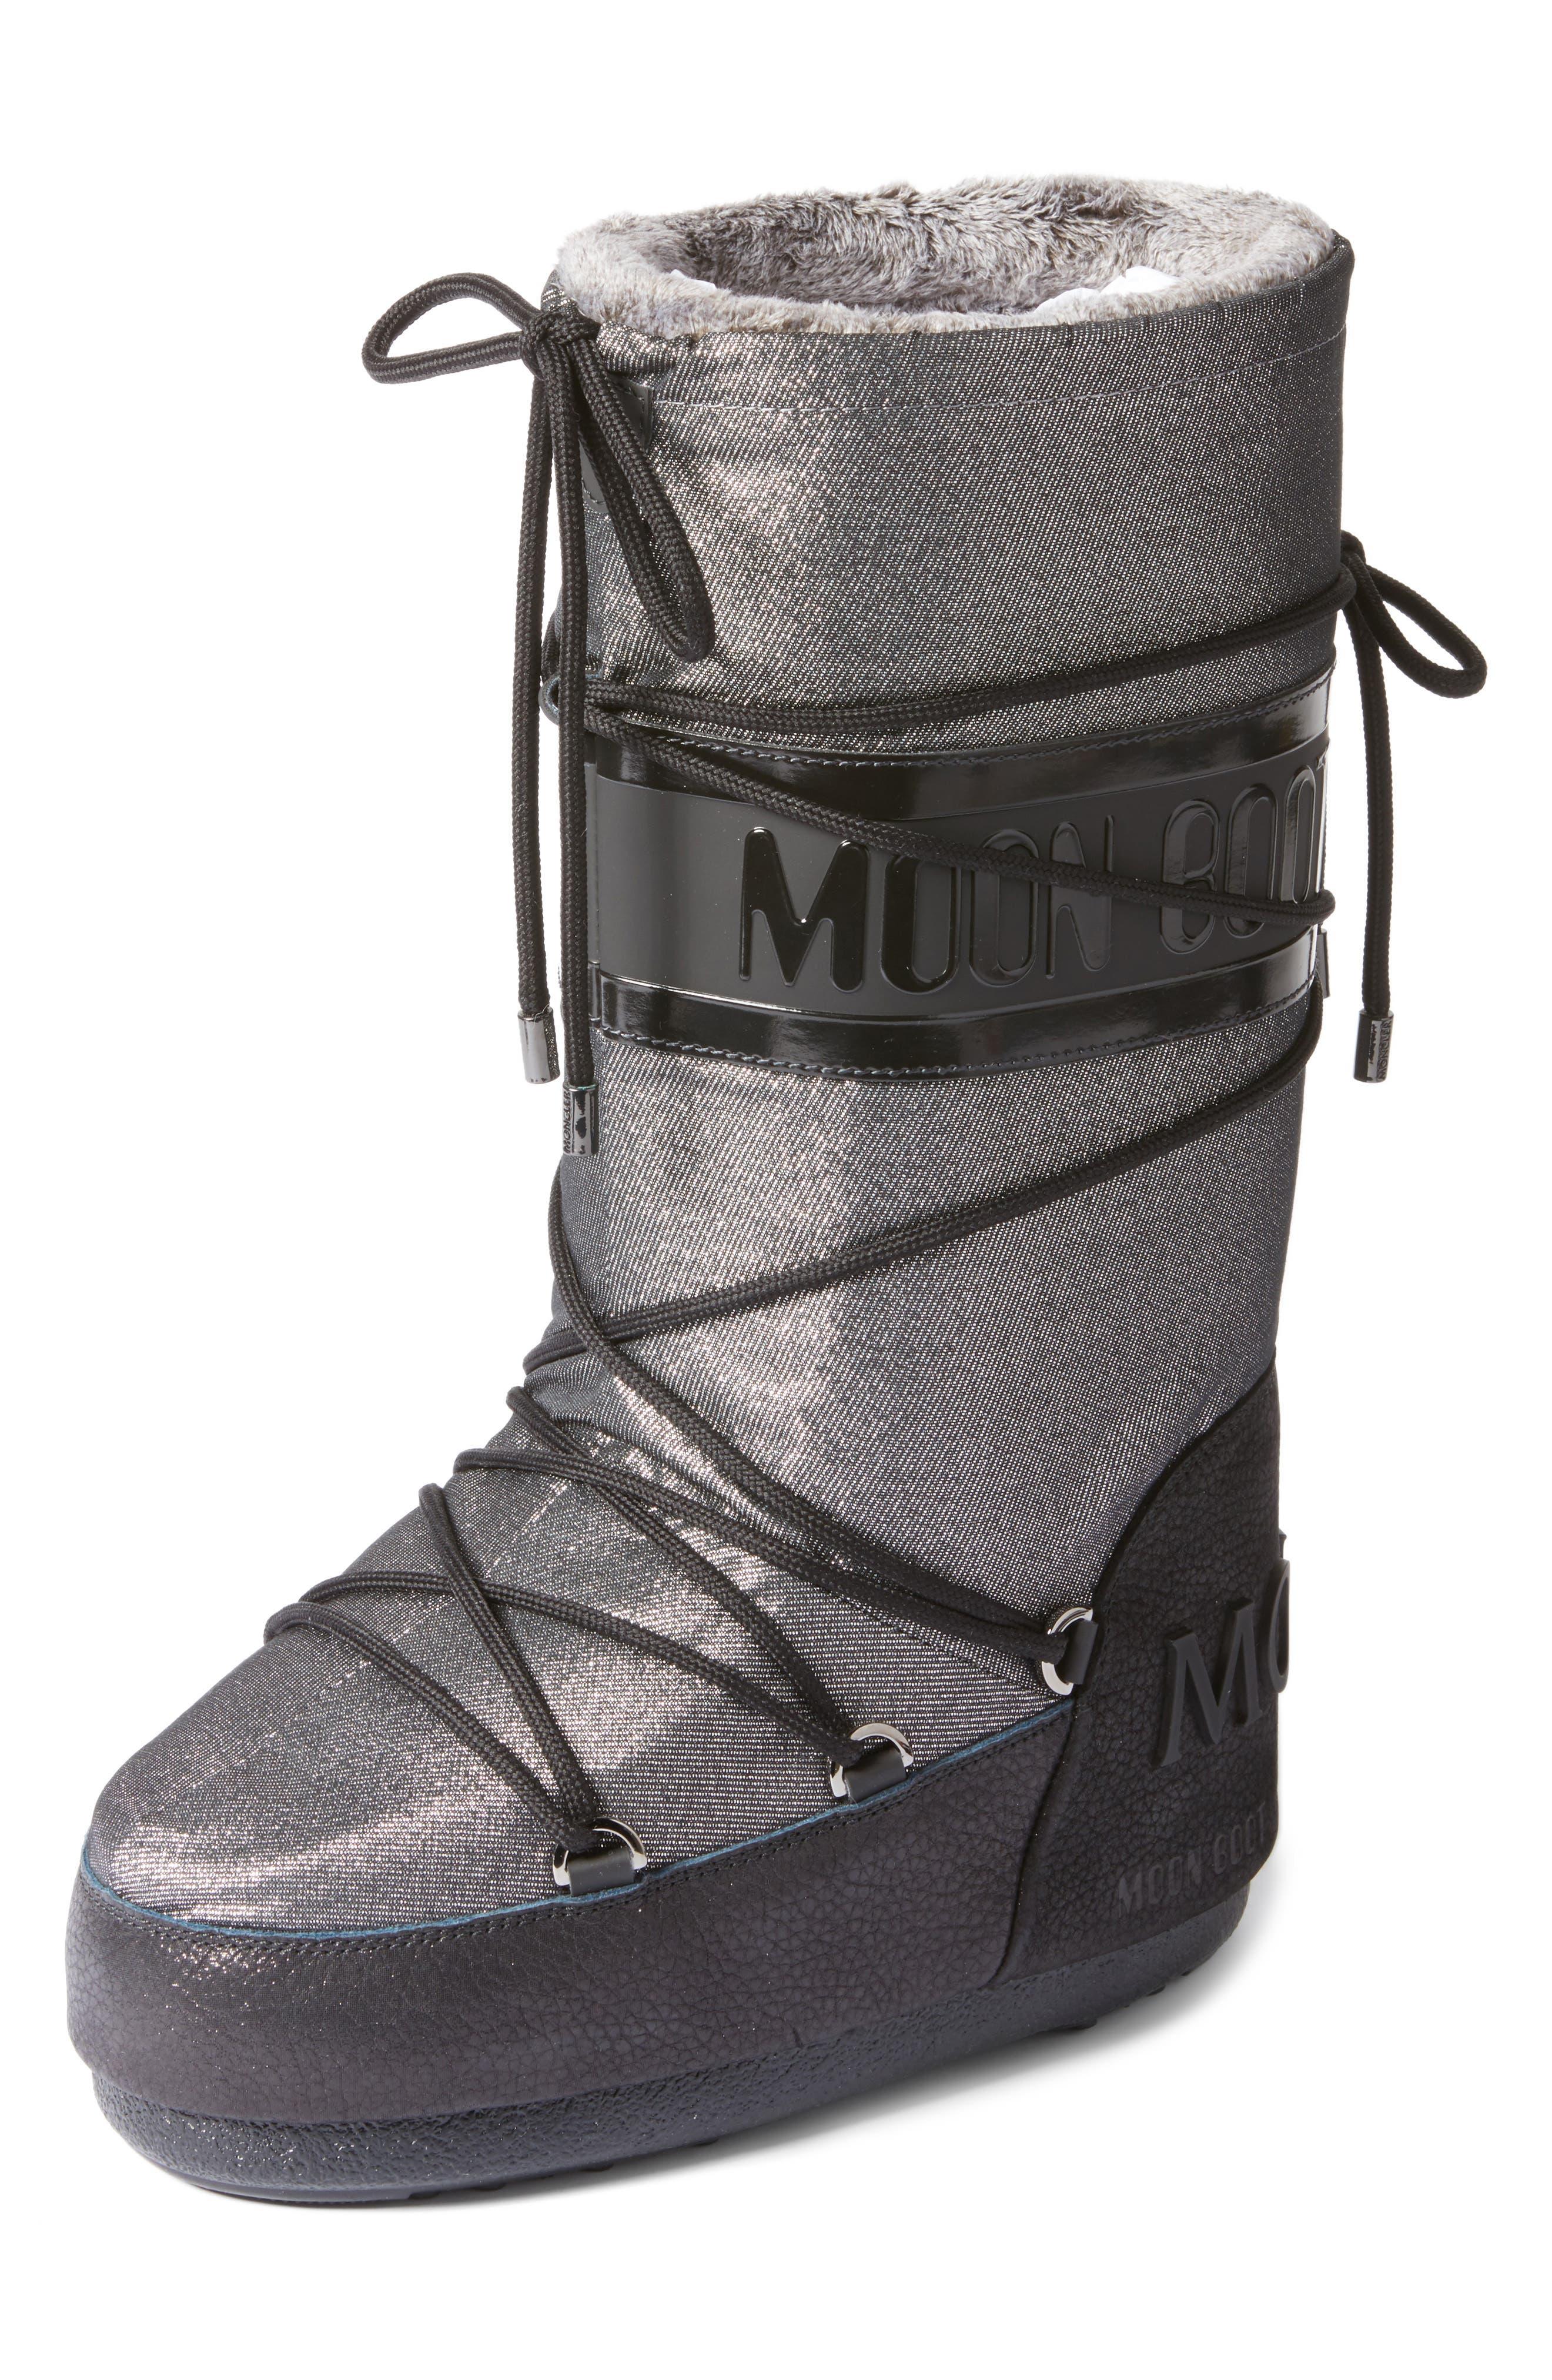 Main Image - Moncler Saturne Moon Boot (Women)